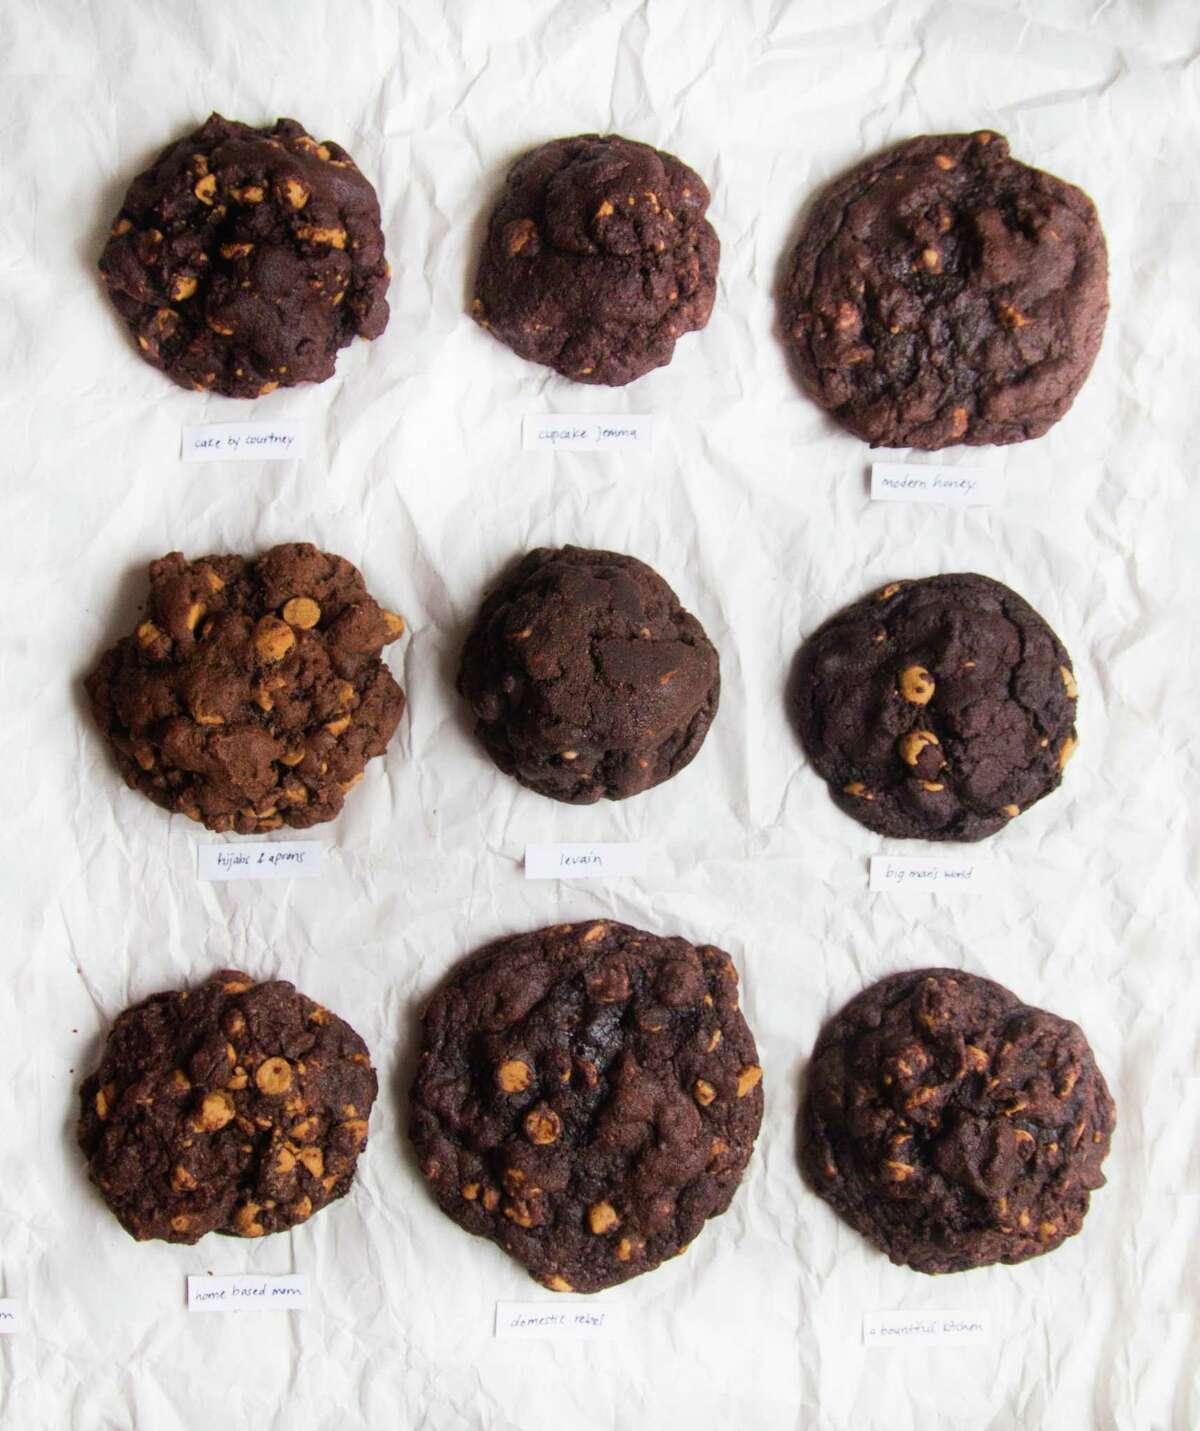 Erika Kwee put various Levain cookie recipes to the test.